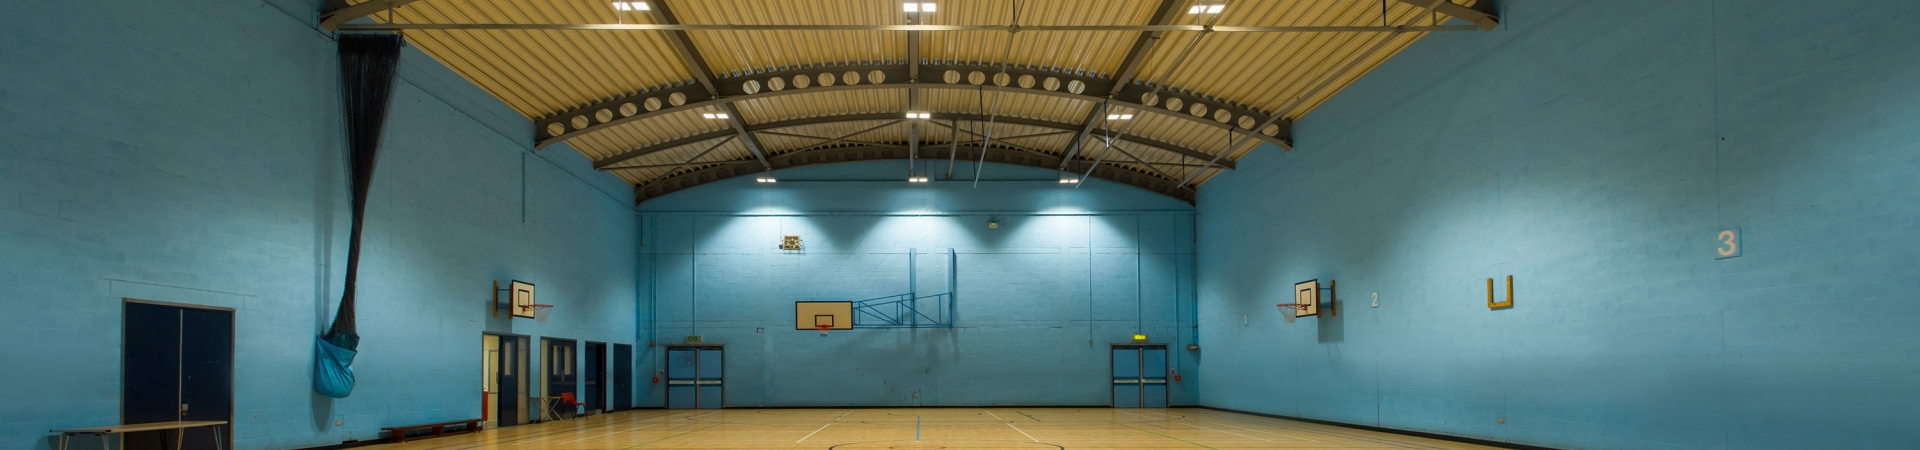 The Abbey School, Faversham, Kent